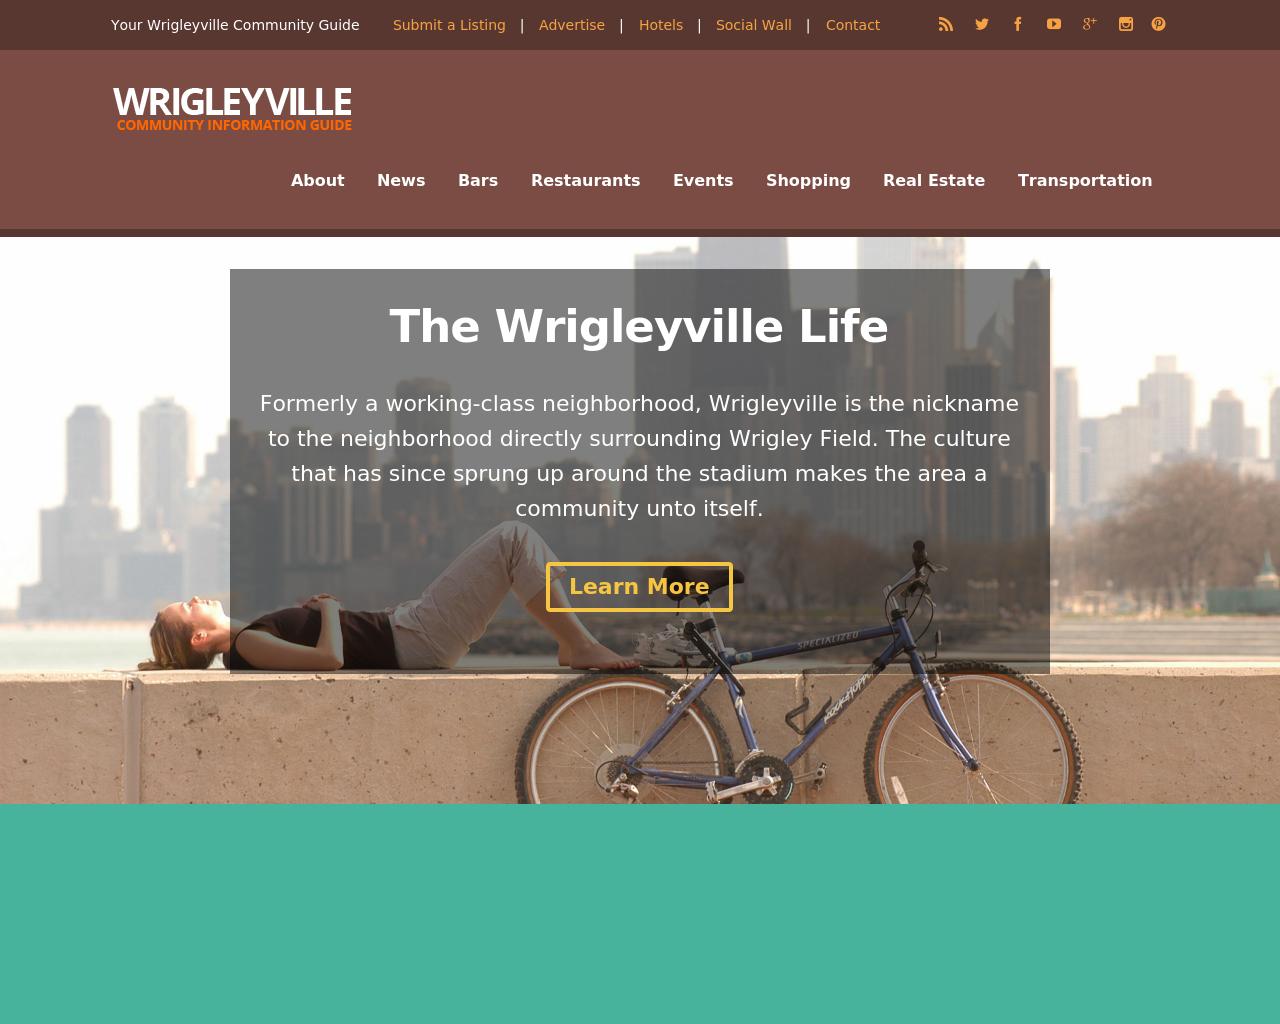 Wrigleyville-Advertising-Reviews-Pricing